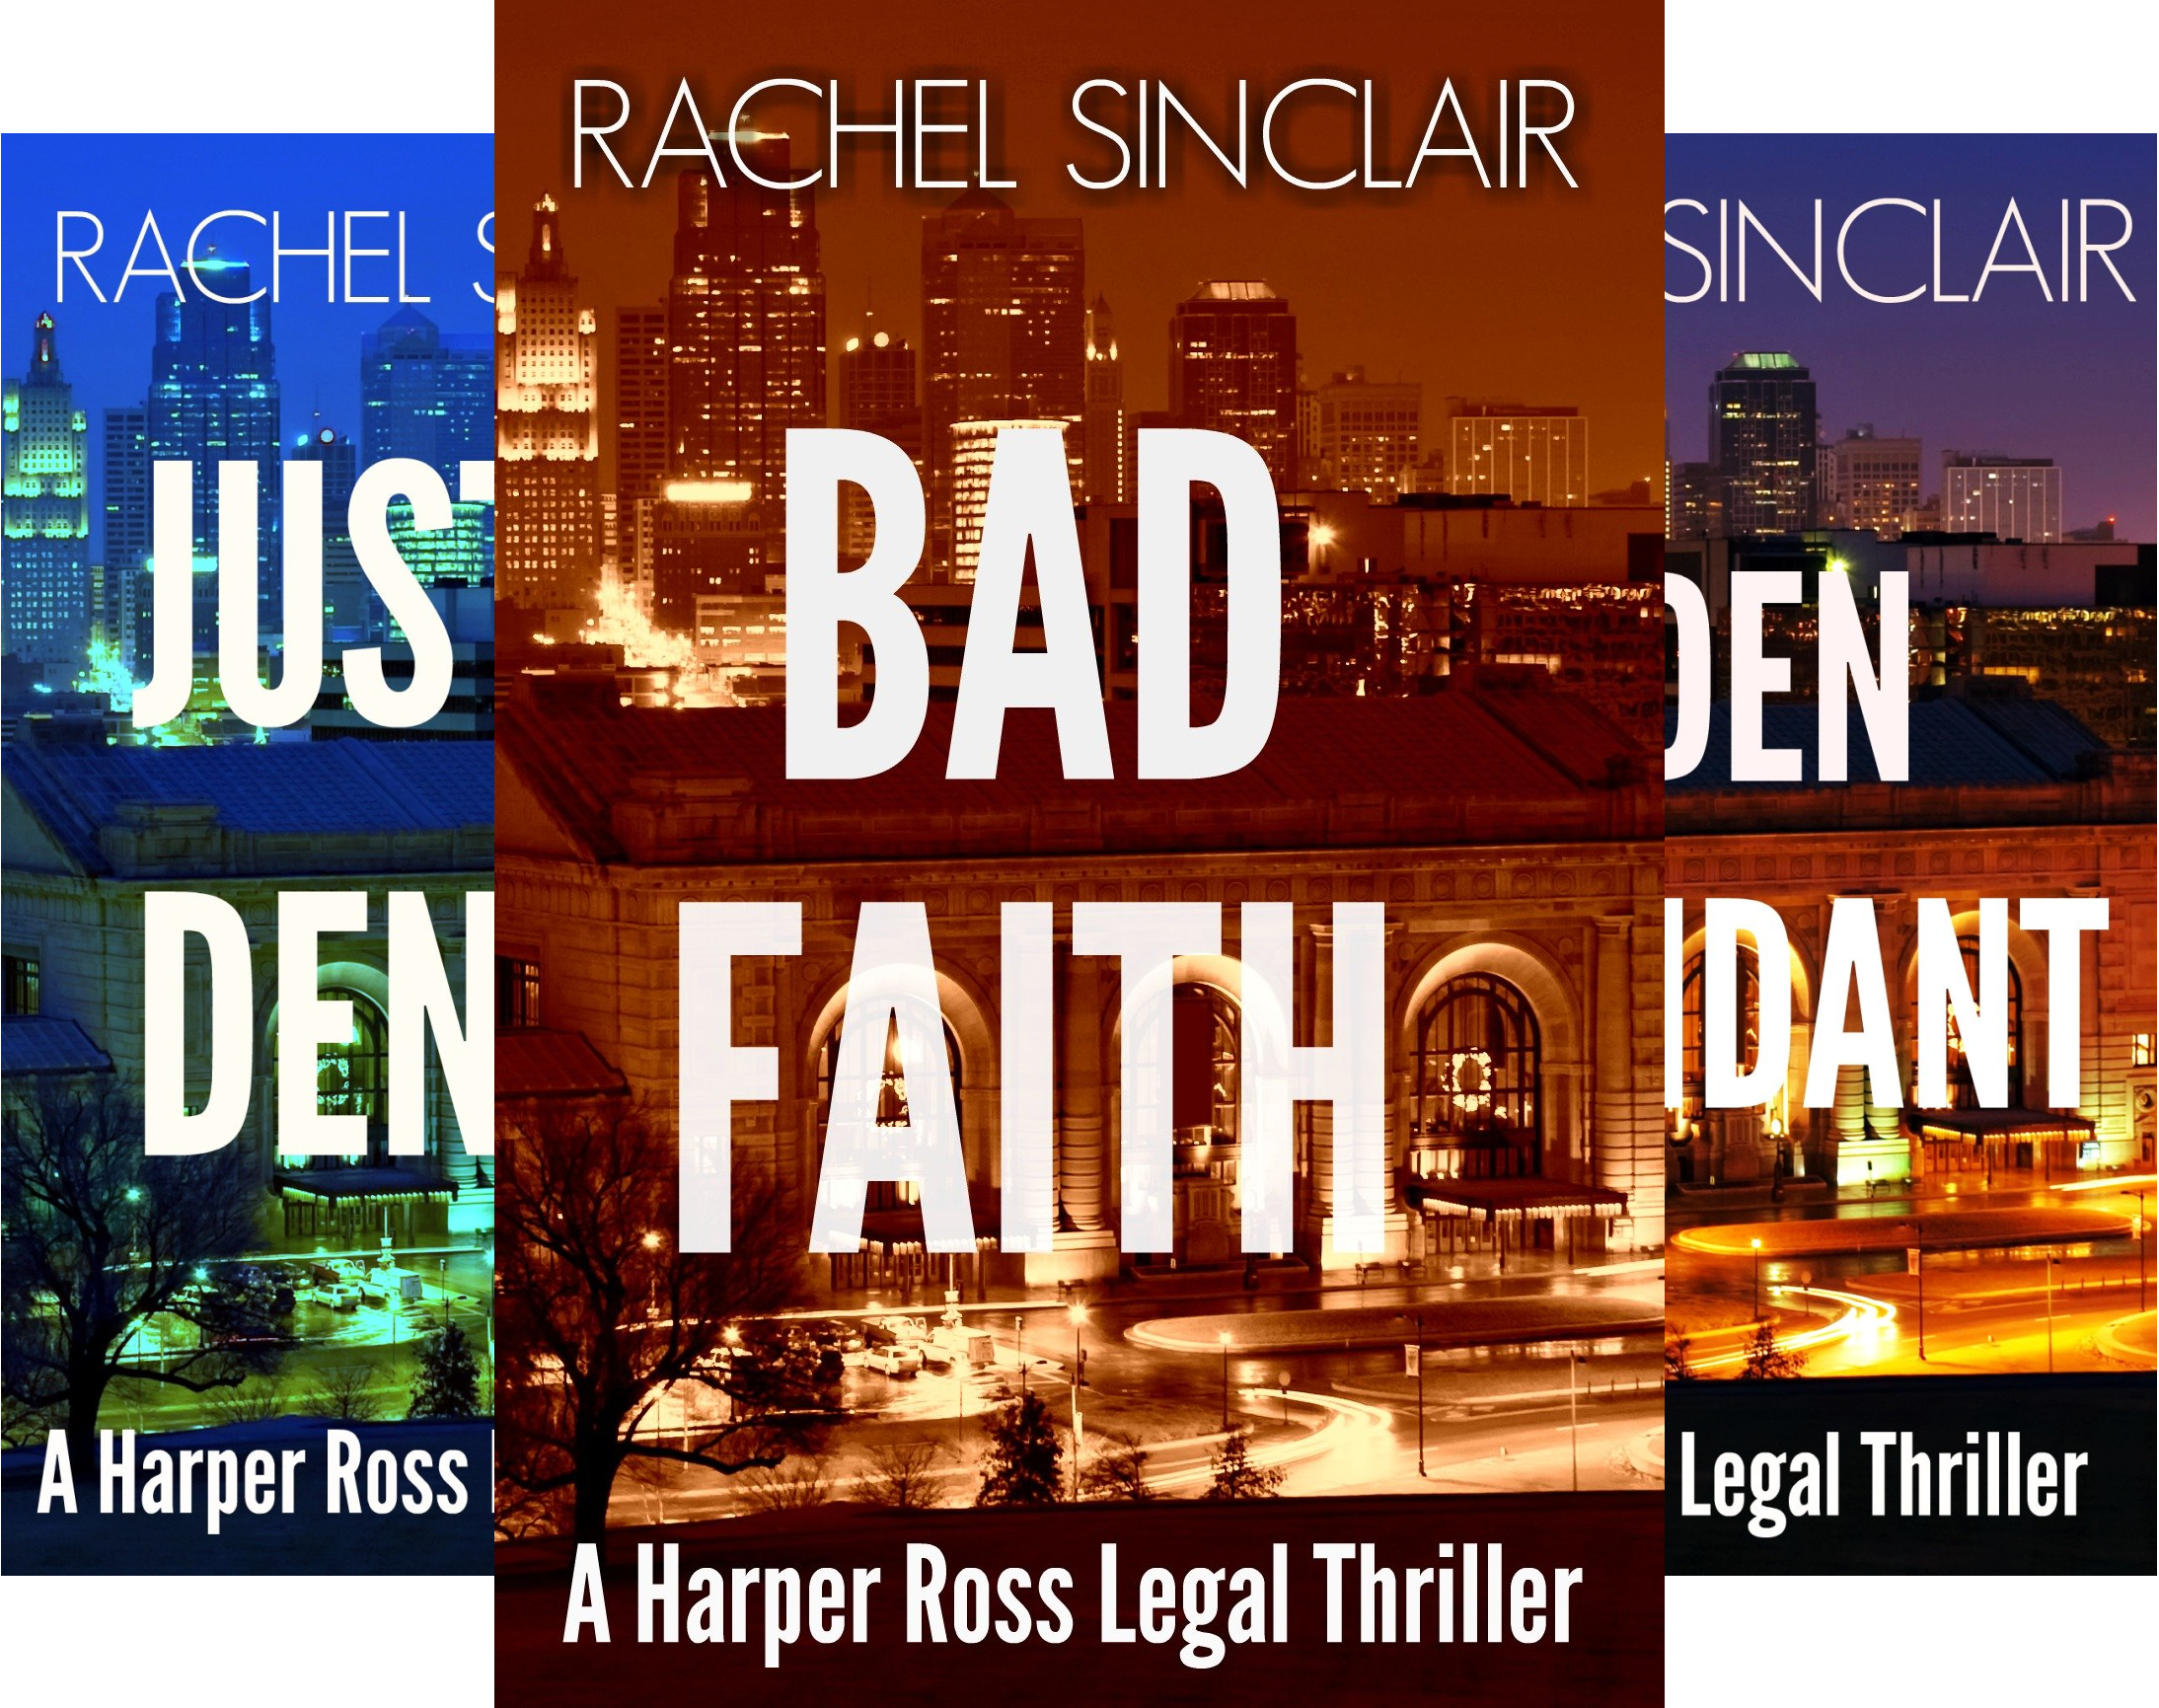 Harper Ross Legal Thriller (3 Book Series)